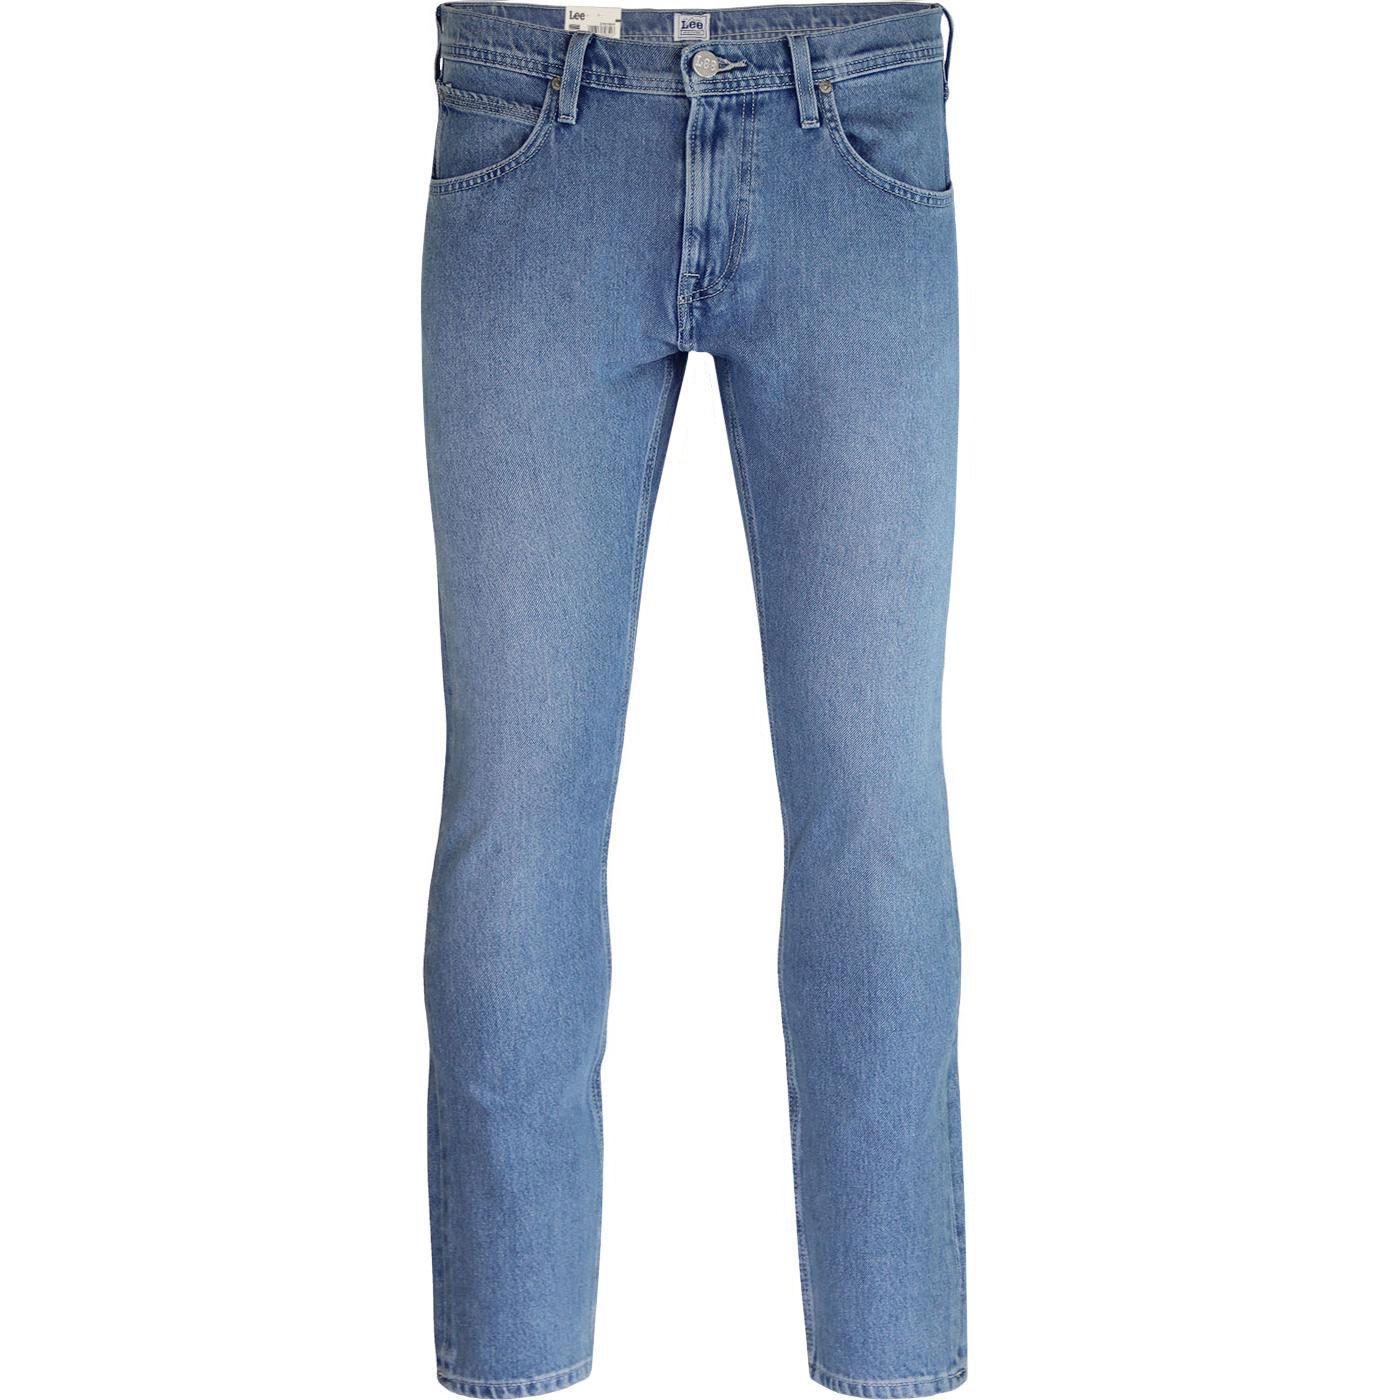 Luke Worker LEE Retro Light Stonewash Jeans